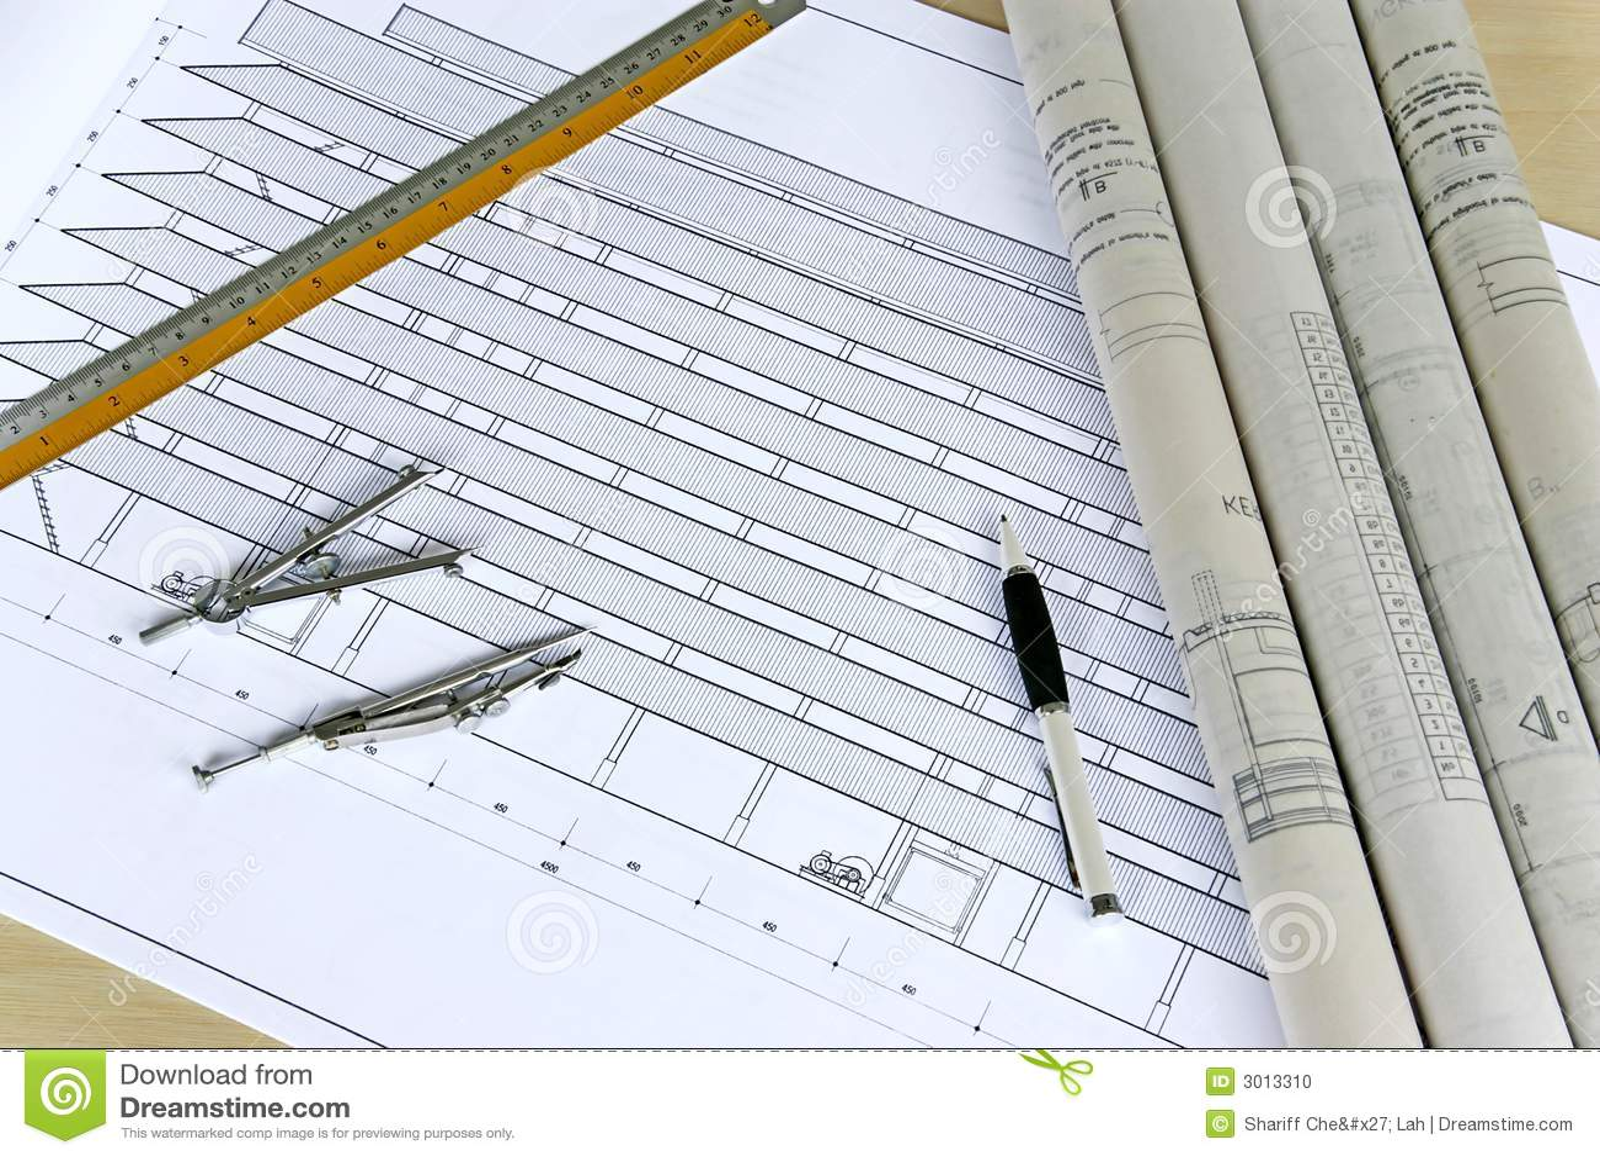 free download civil engineering drawing pdf